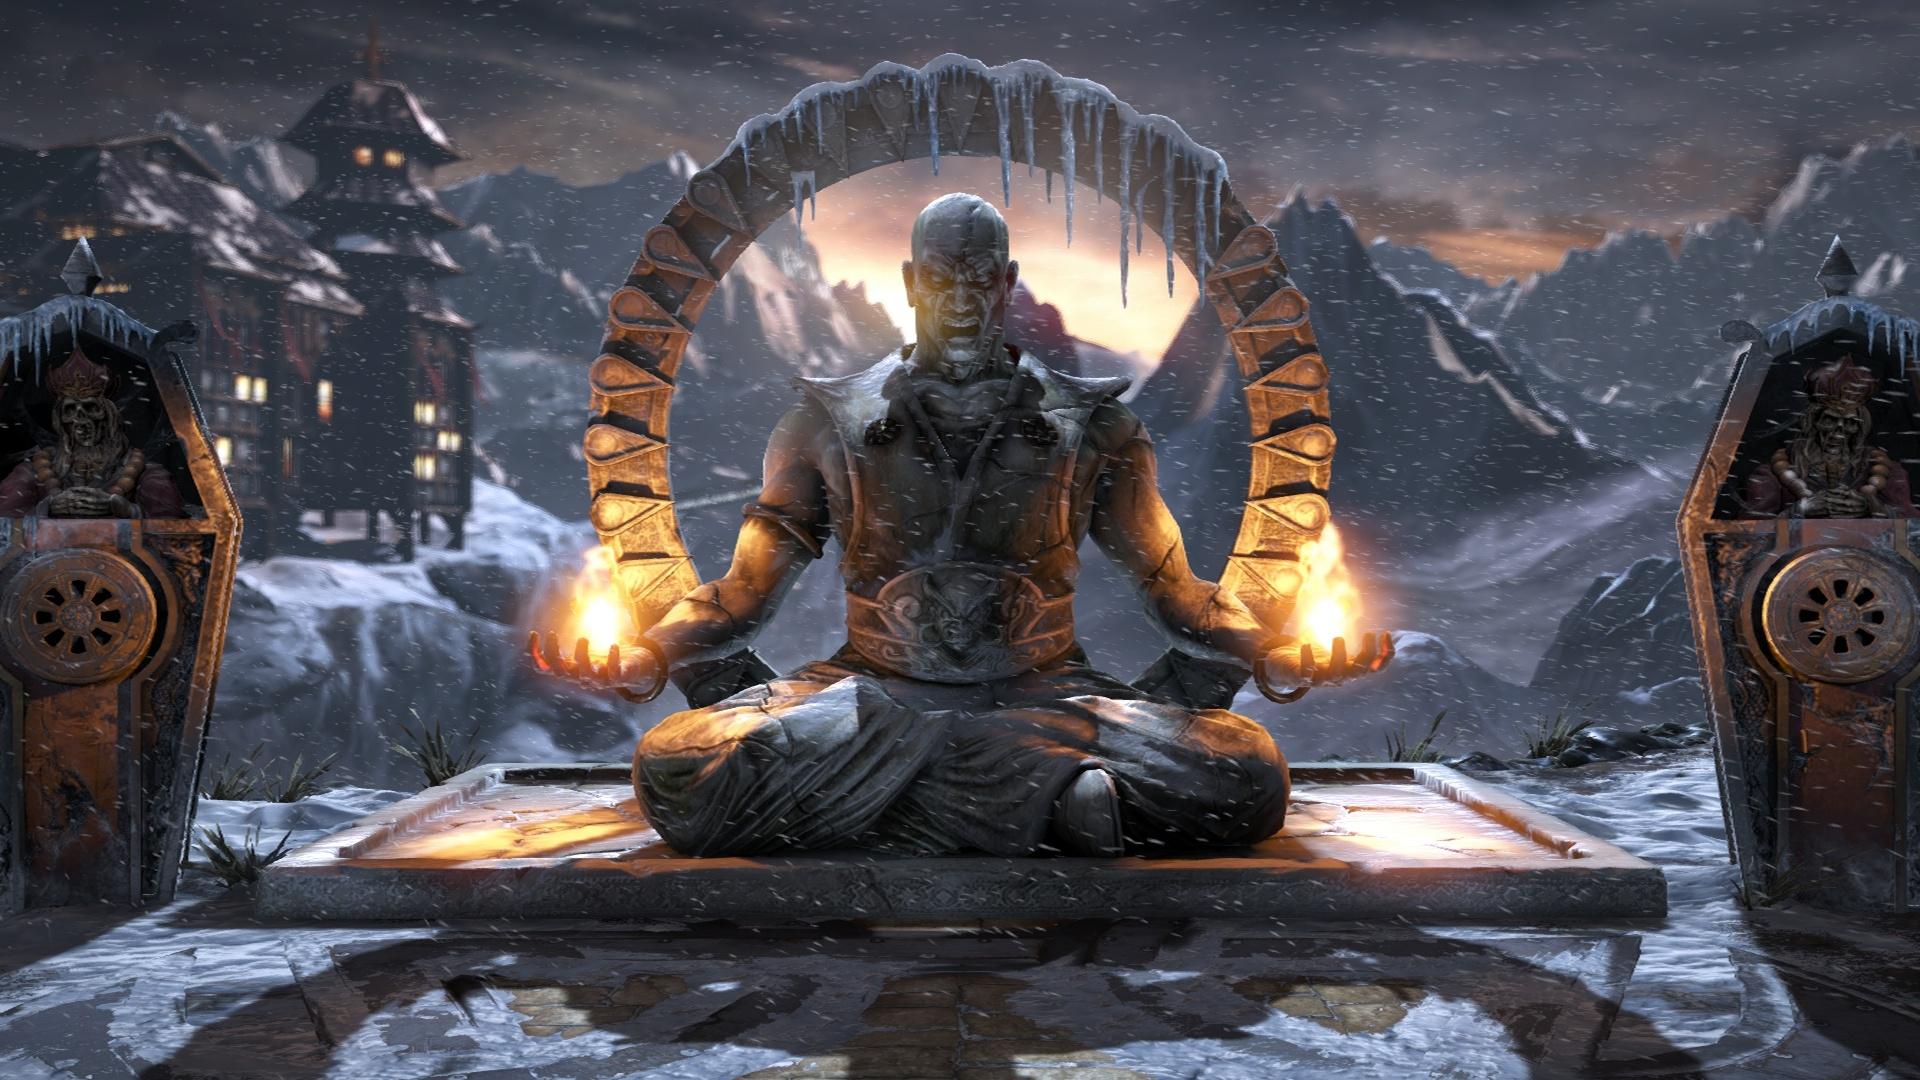 Mortal Kombat 11 Rambo Trailer Shows First Gameplay and